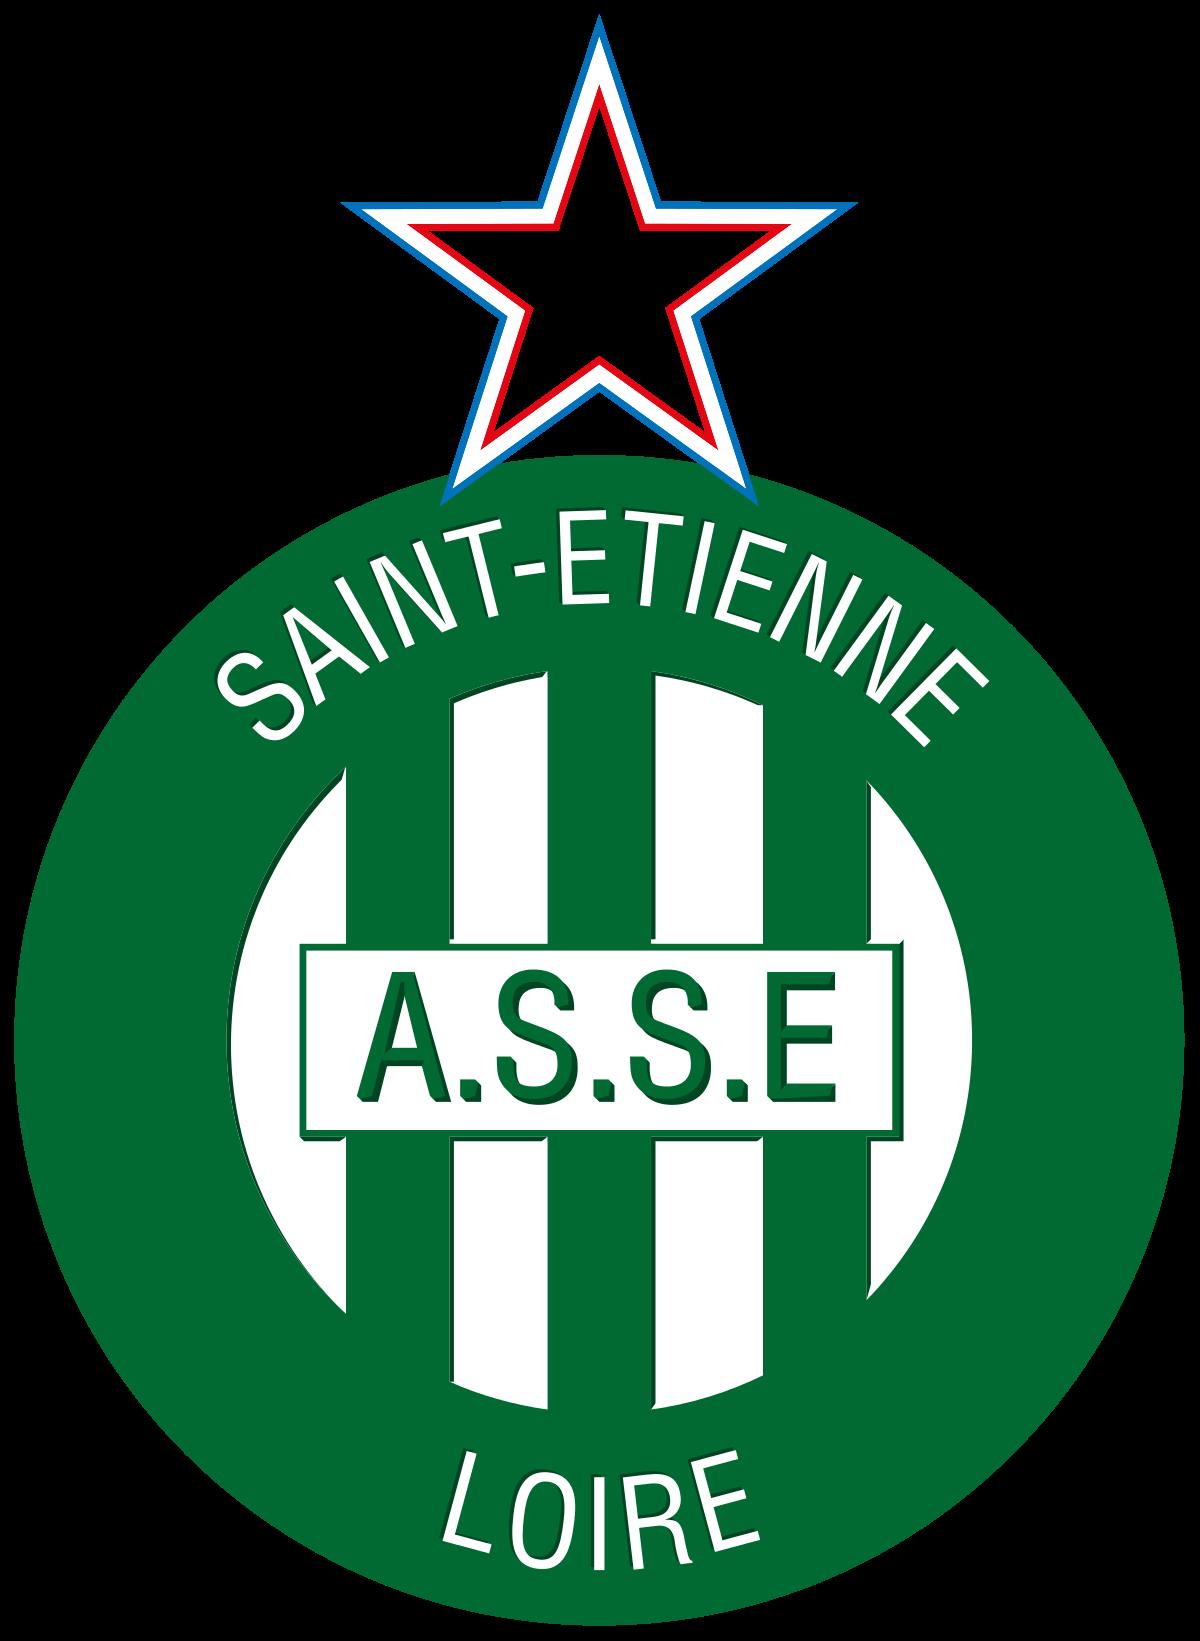 Saint-Etienne-2 logo